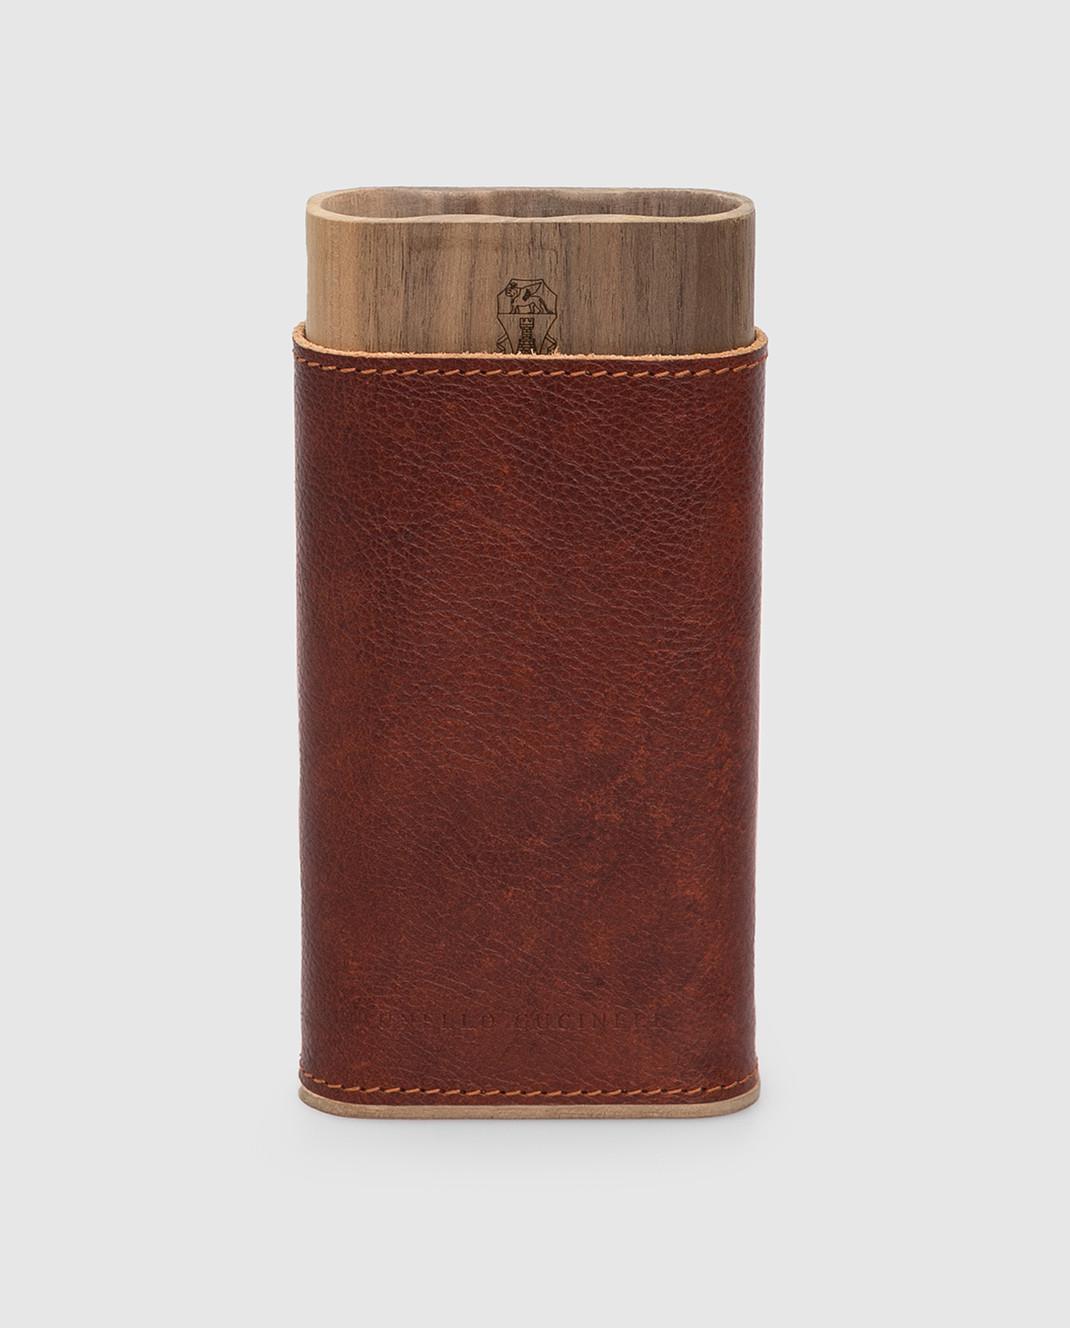 Brunello Cucinelli Тубус для сигар изображение 1